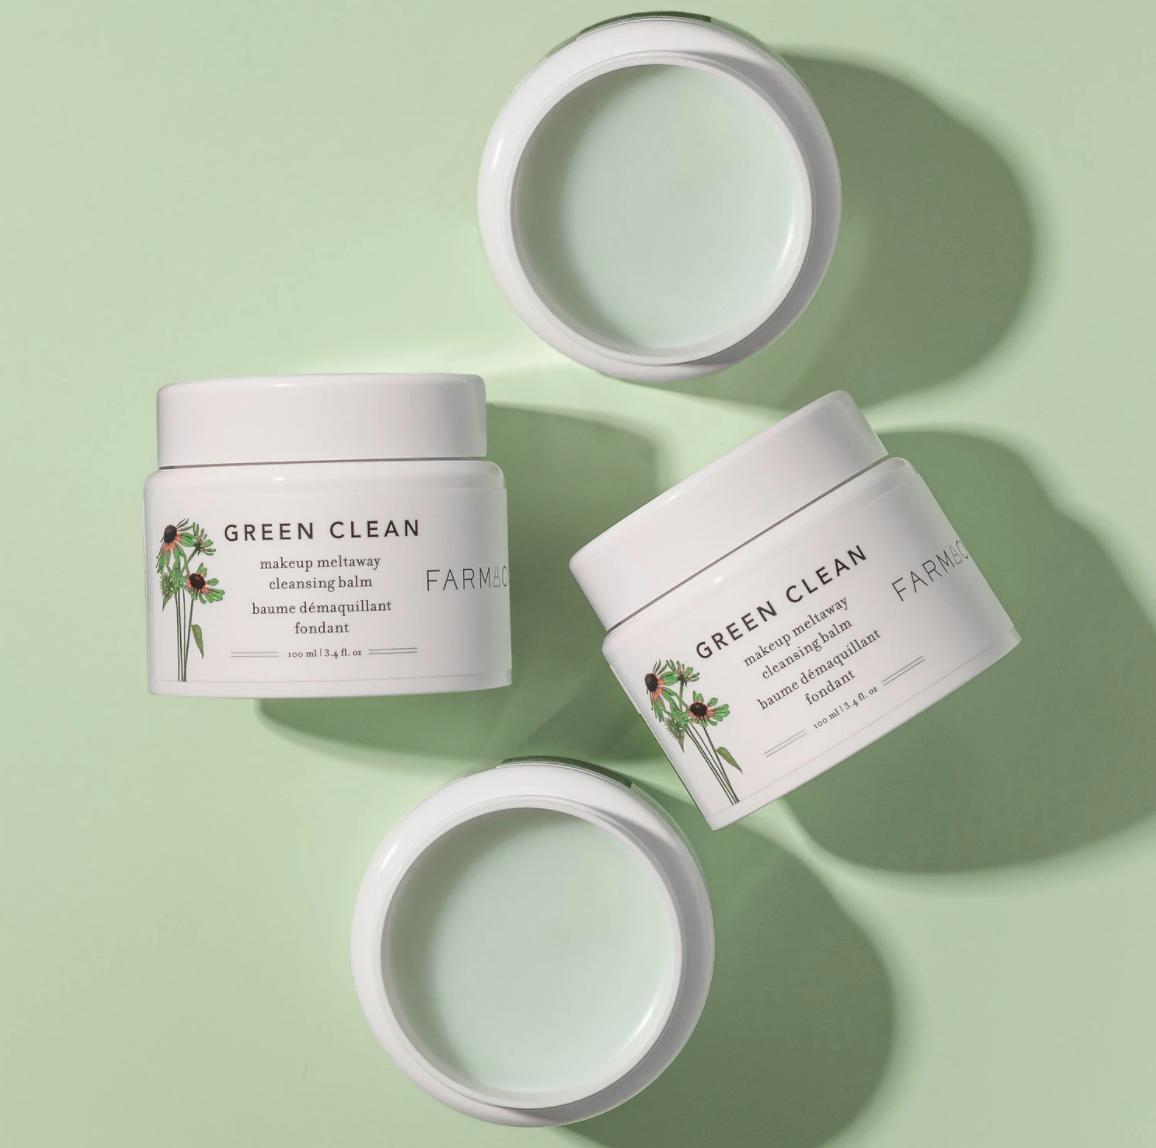 farmacy green clean